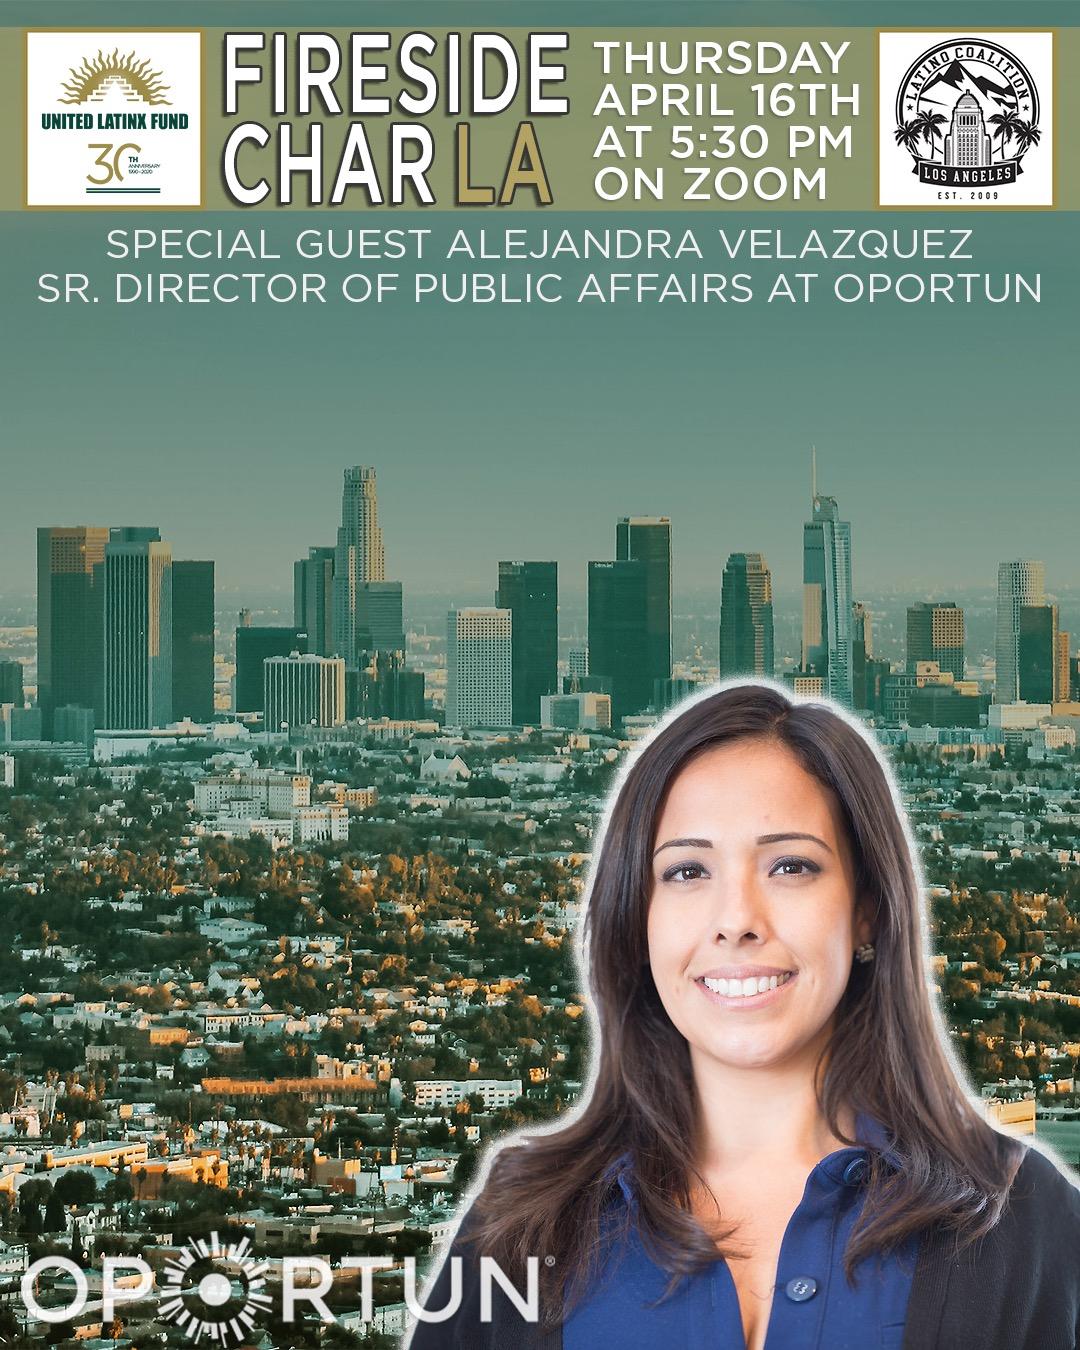 4/16/2020 Fireside CharLA - Featuring Alejandra Velazquez